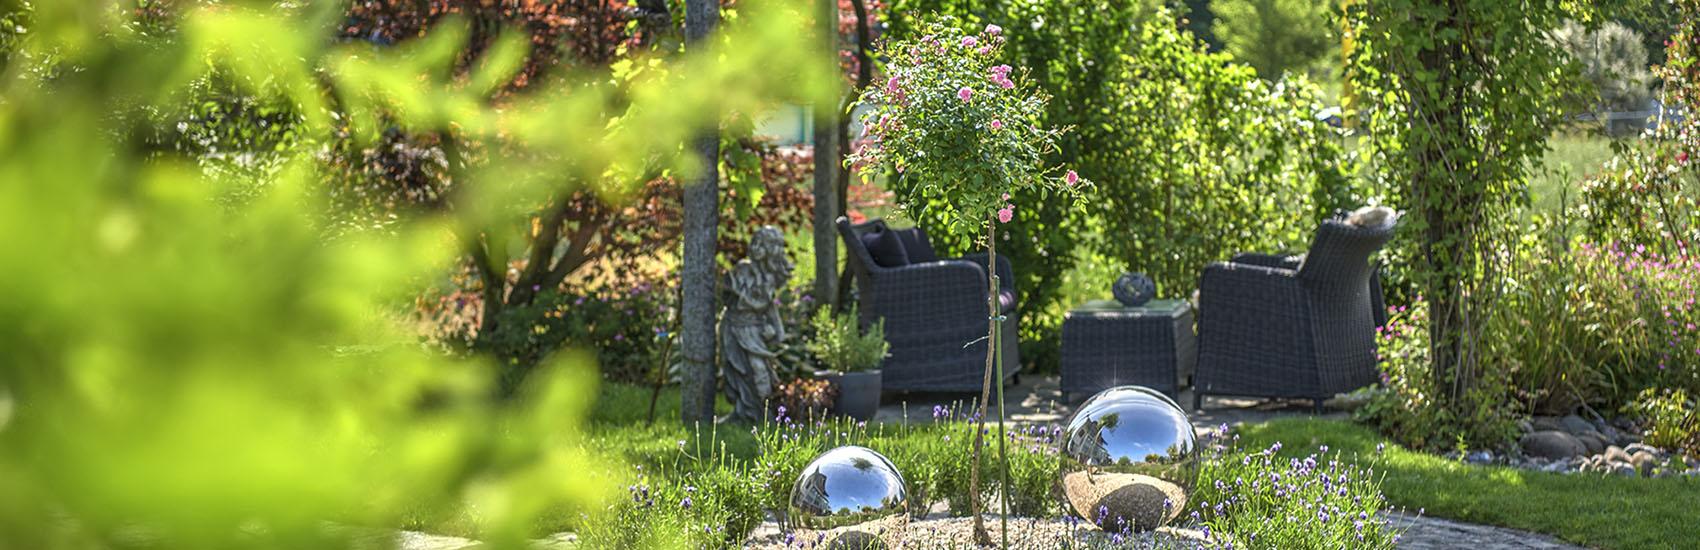 Amstutz Gartenbau AG, Gartenplanung, Gartenbau